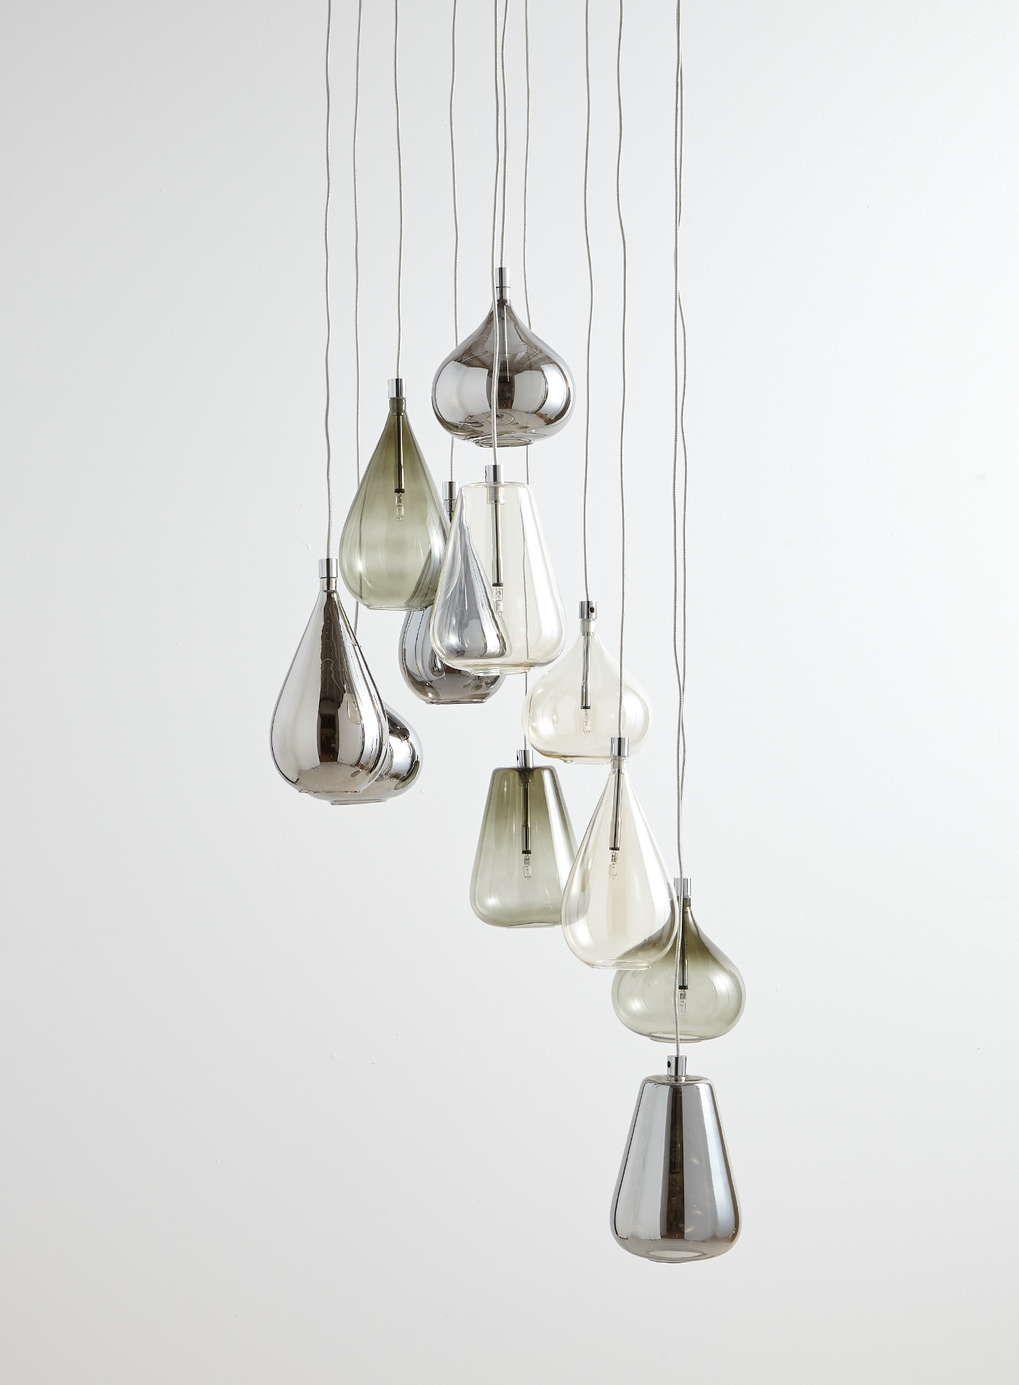 Smoke Nadine Cluster Light Ceiling Lights Home Lighting Amp Furniture Bhs For The Home